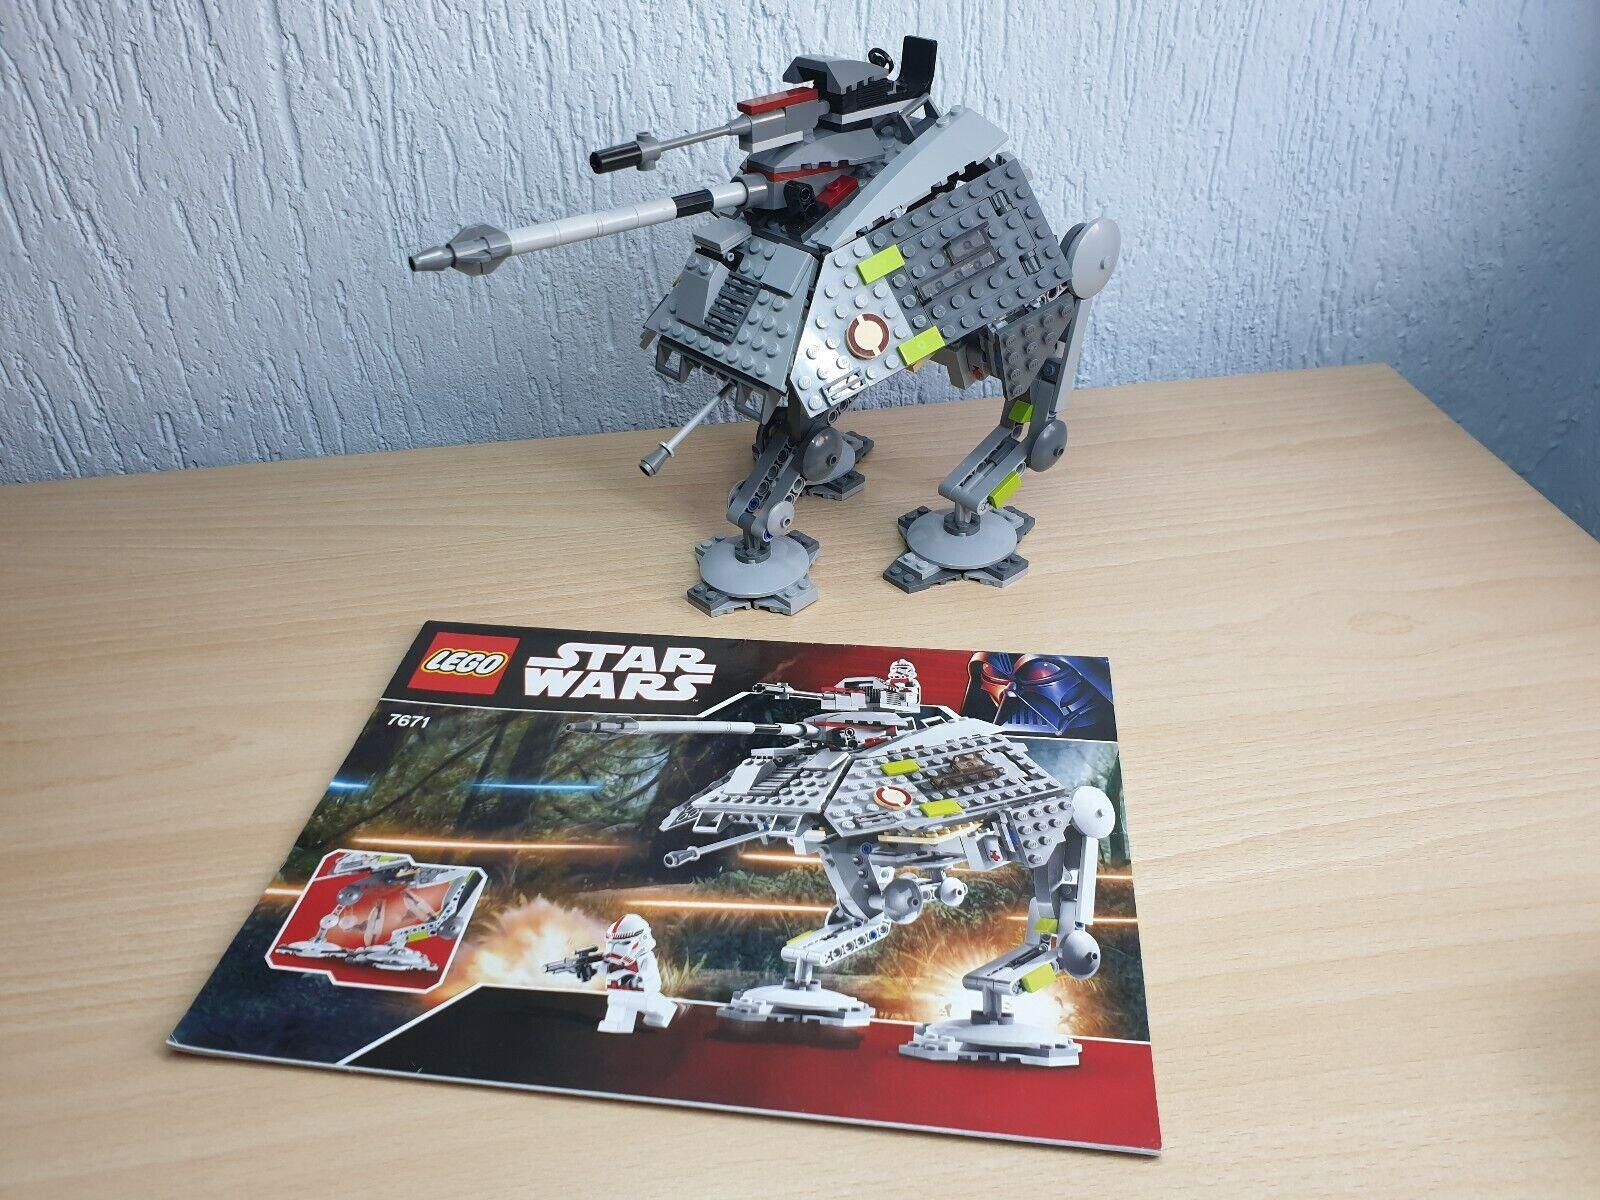 LEGO StarWars AT-AP Walker (7671)